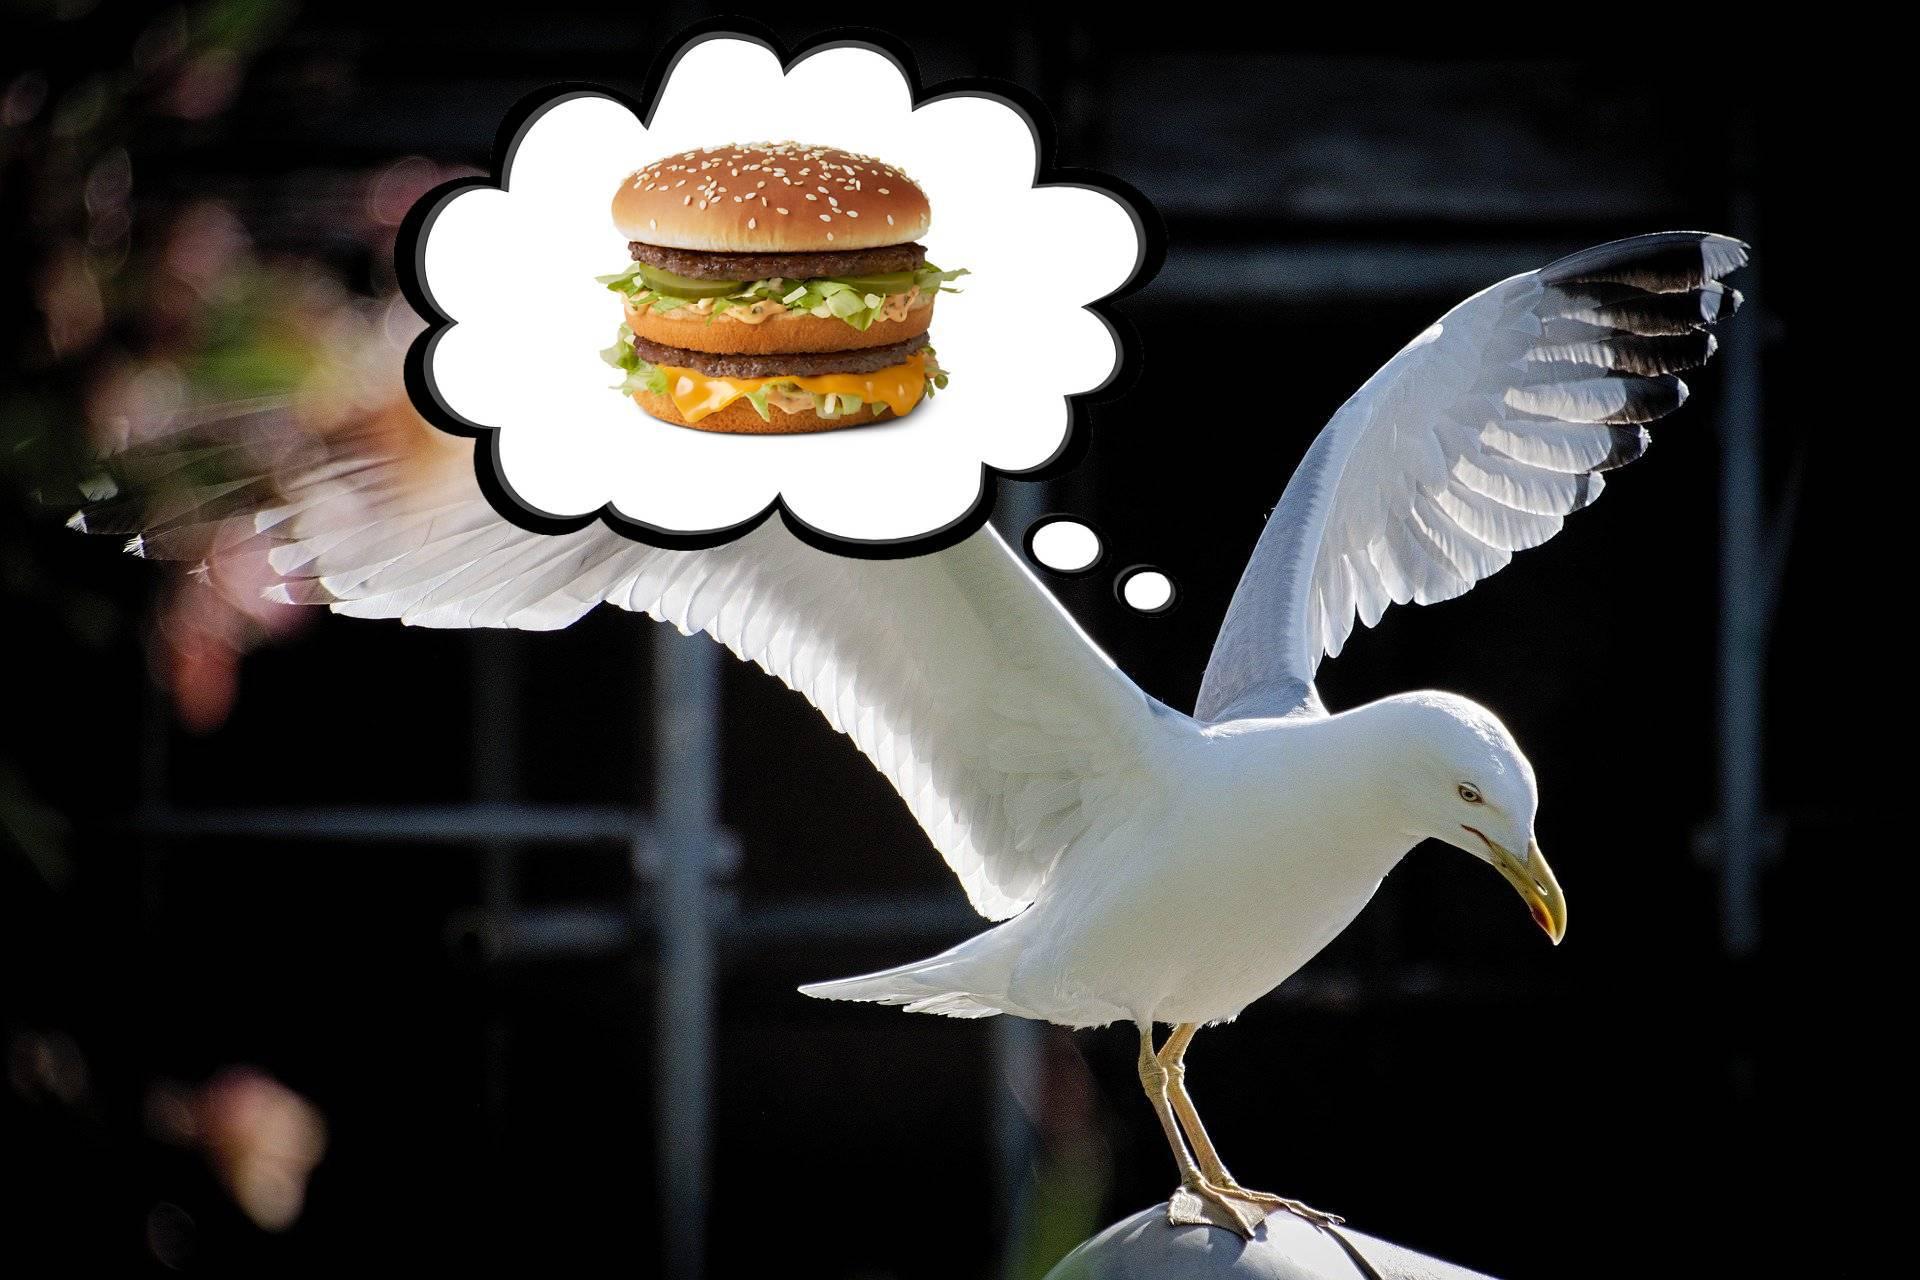 Oko za oko:  Tip ugrizao galeba koji mu je htio oteti hamburger